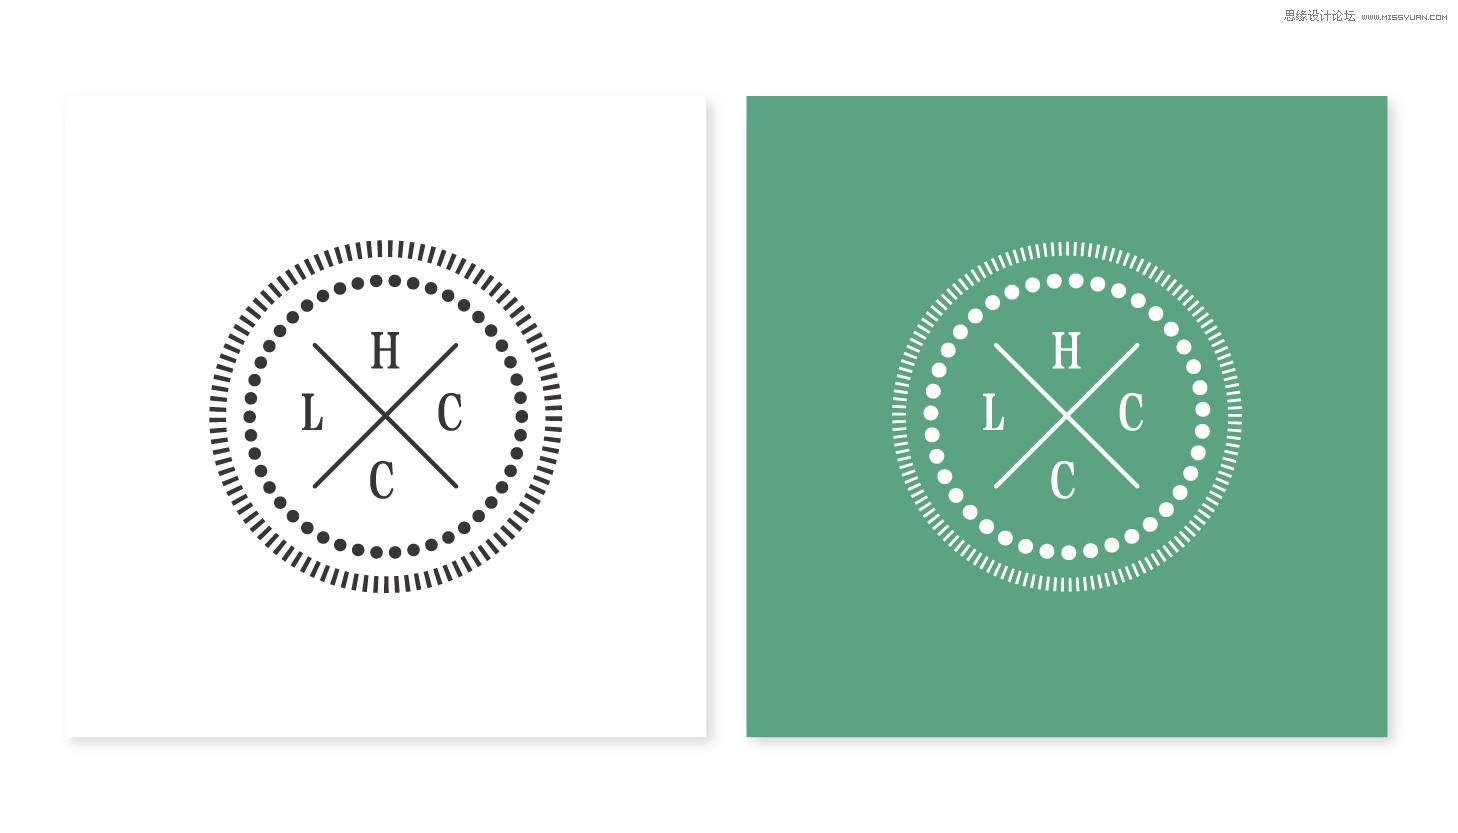 Illustrator详细解析描边功能实用小技巧